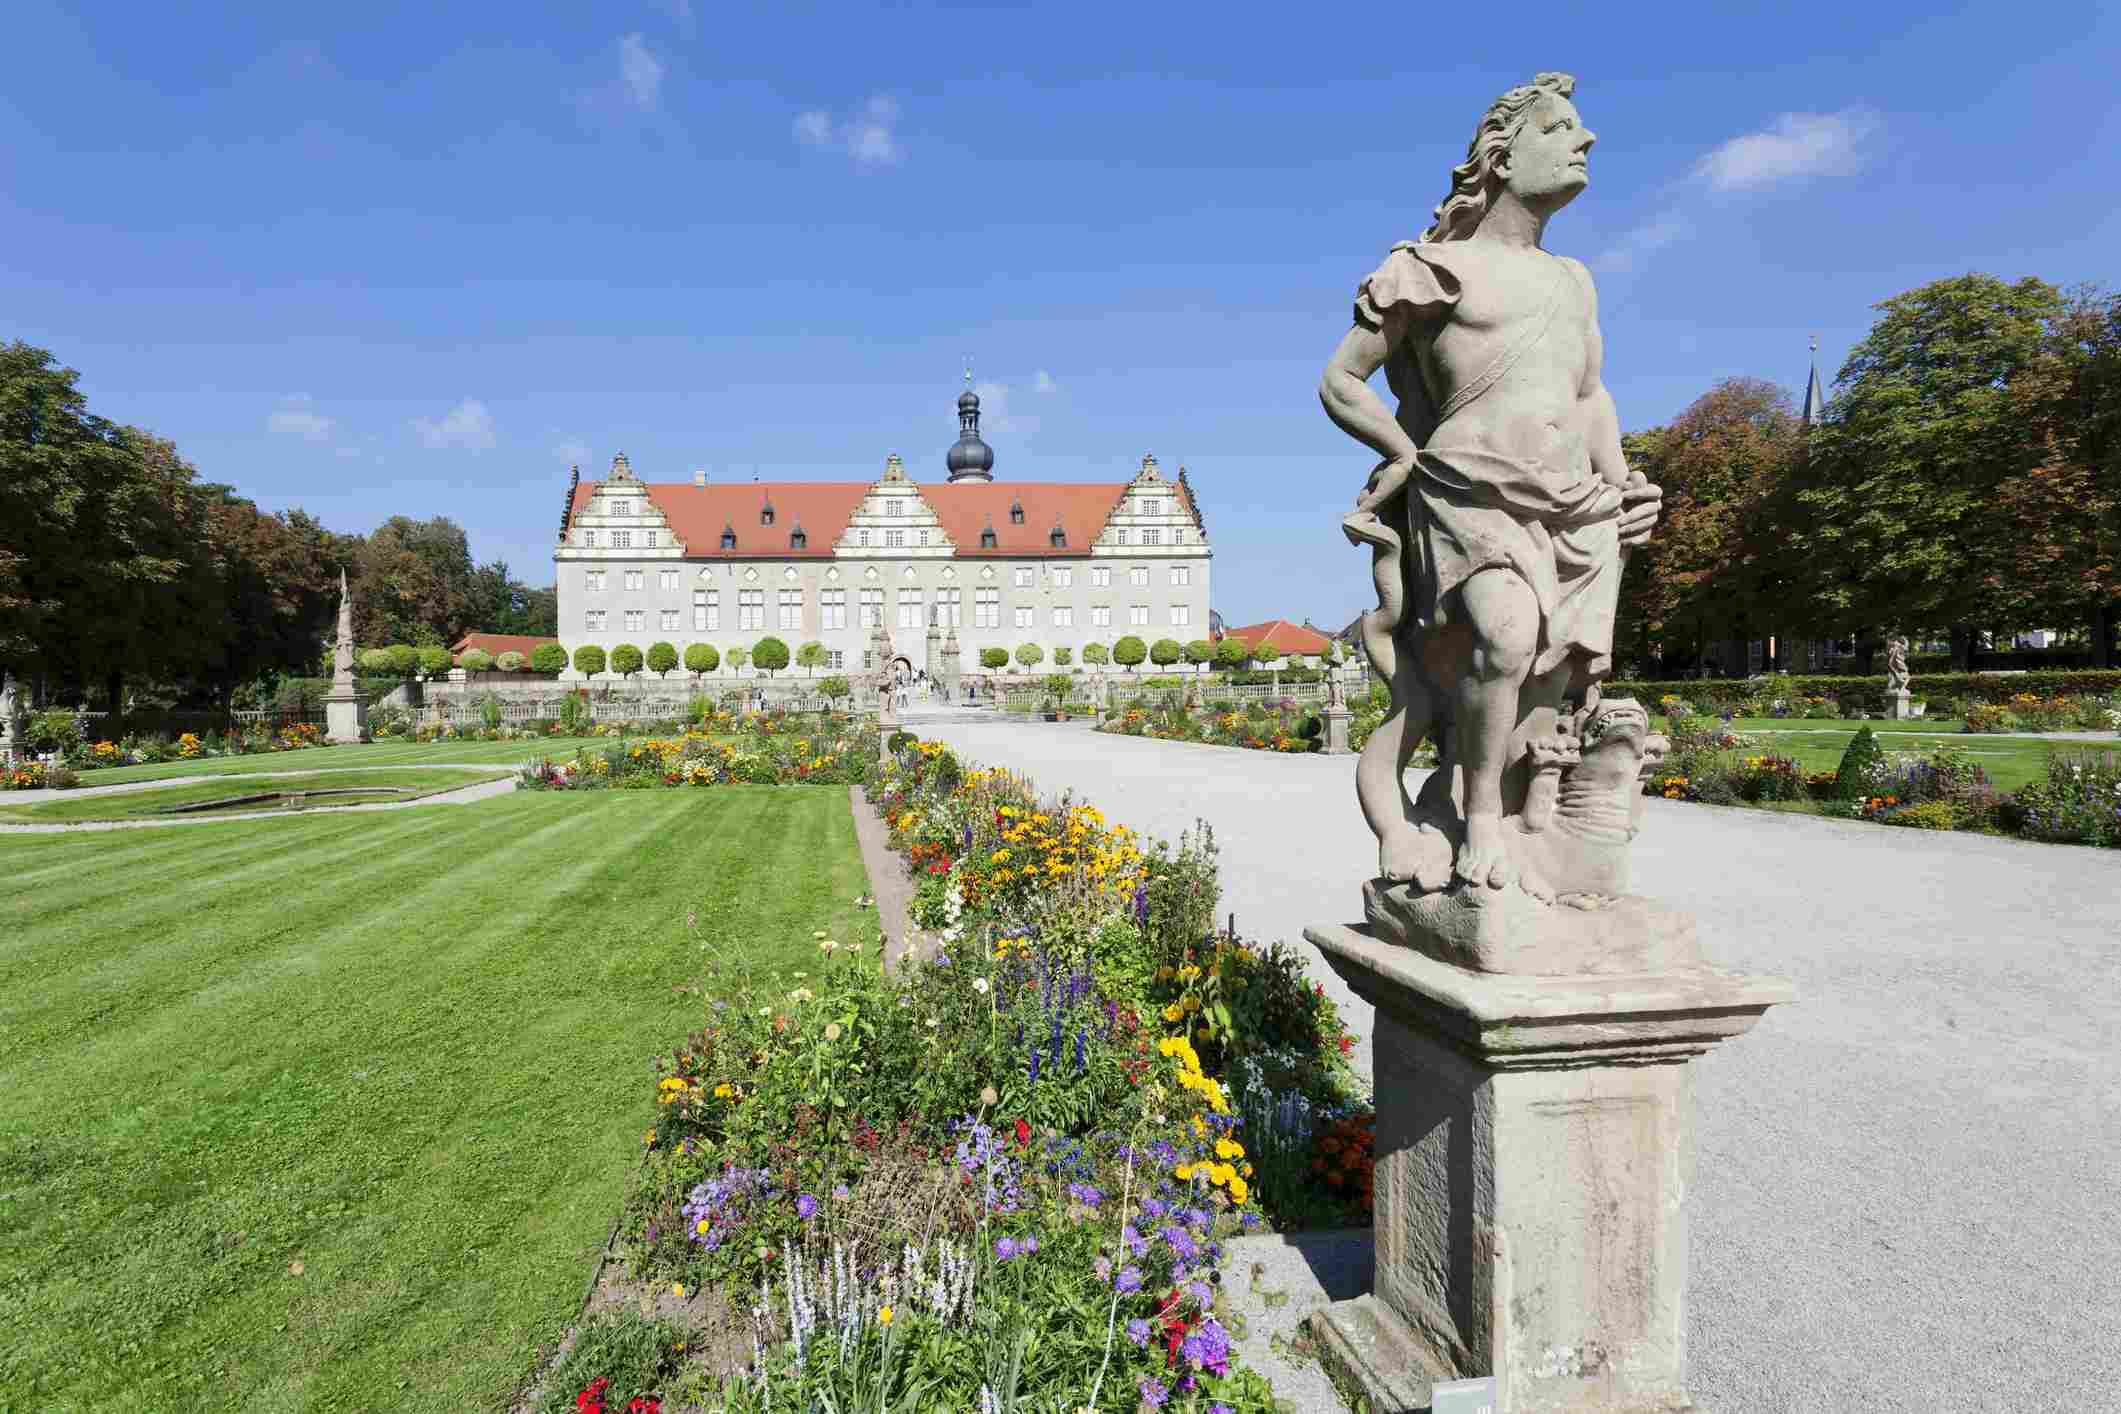 Weikersheim Castle, Weikersheim, Baden-Württemberg